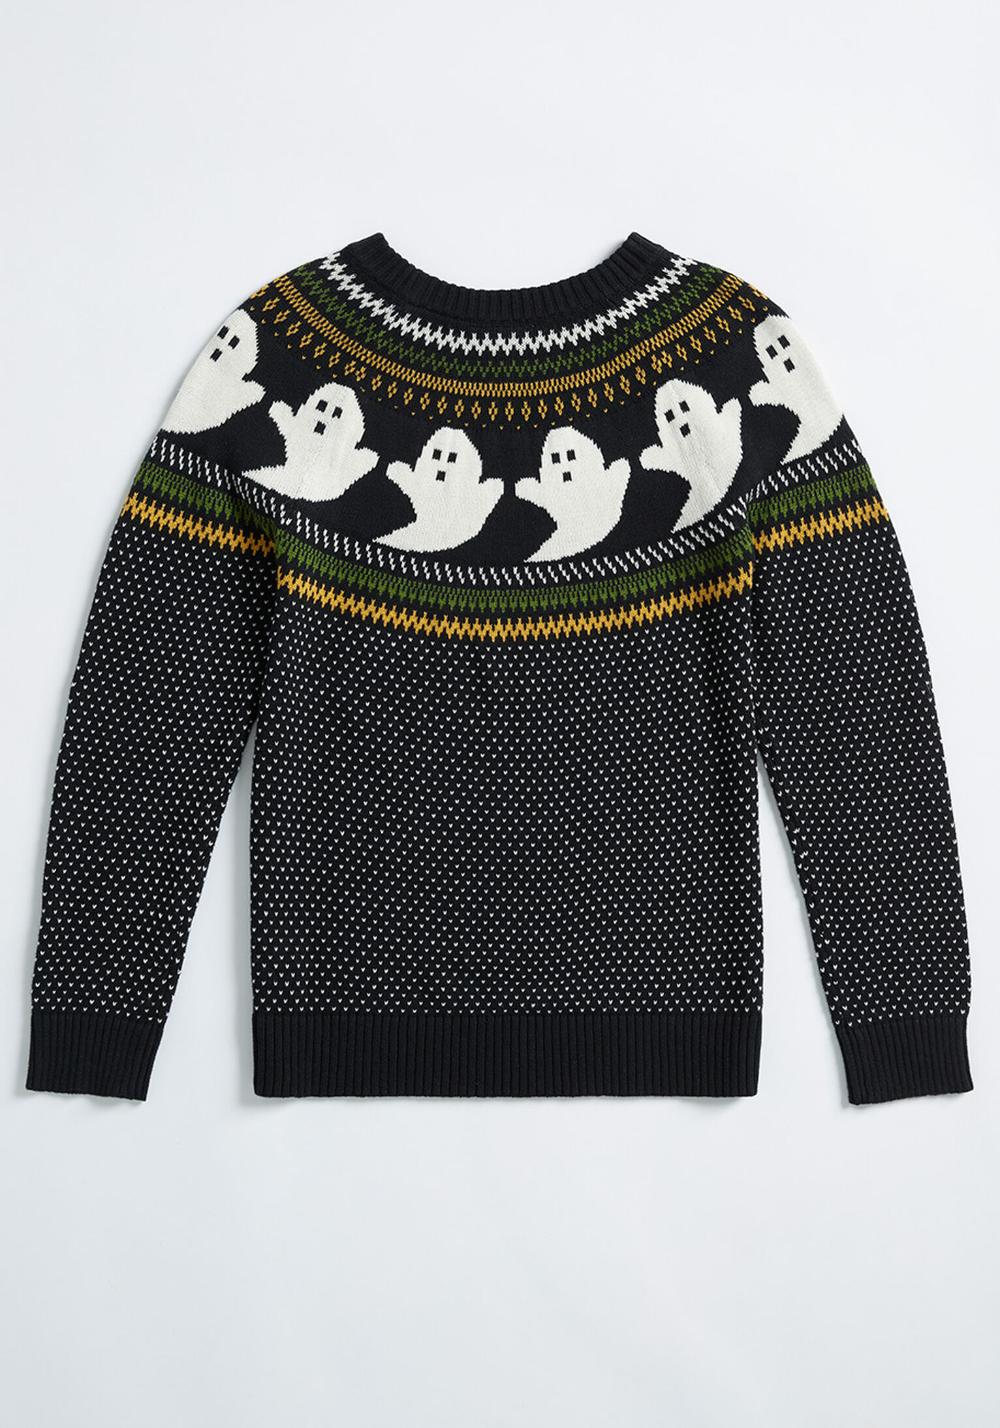 Rawr Ambition Dinosaur Pullover Sweater